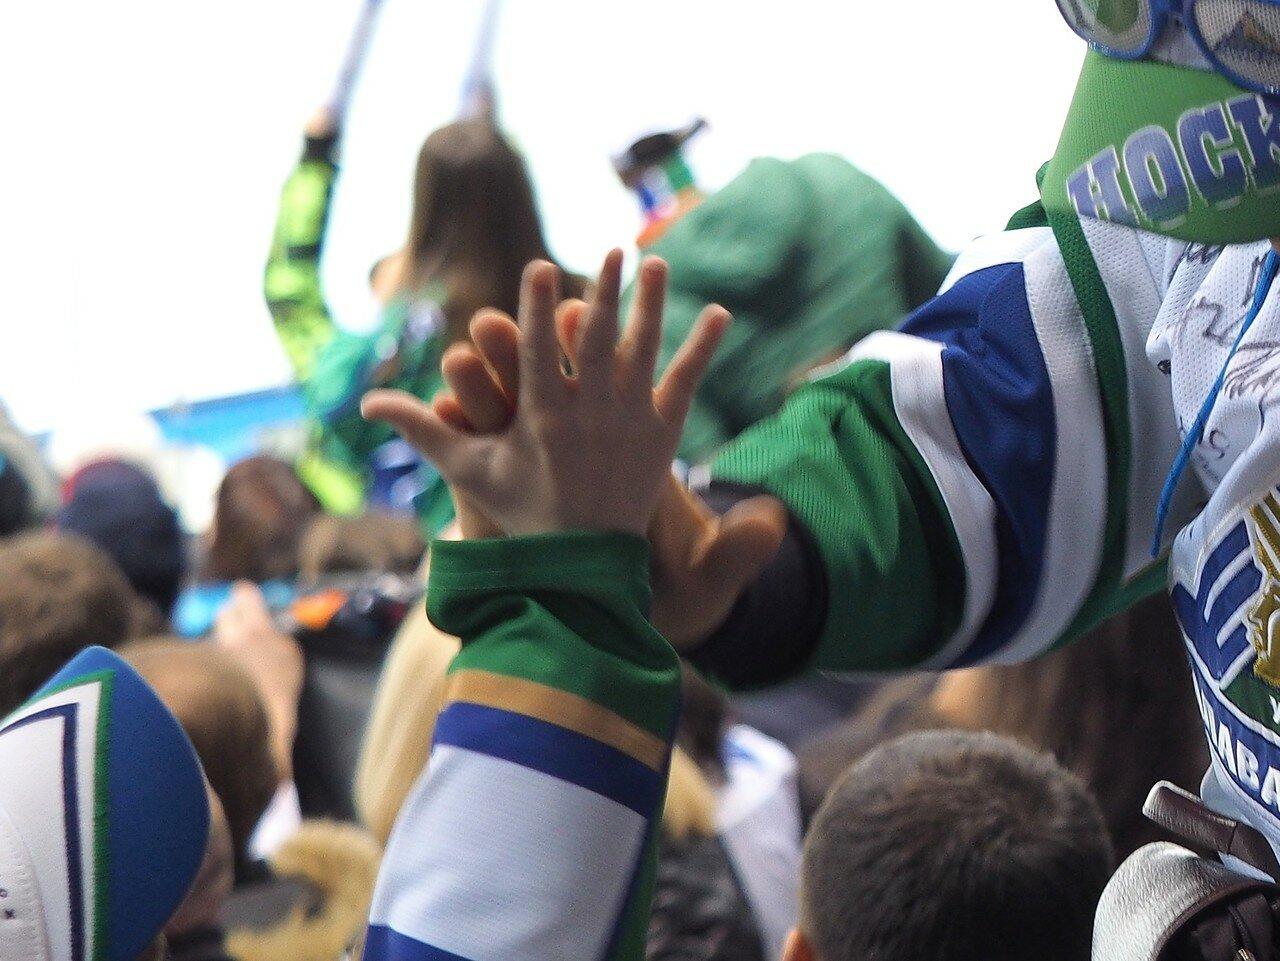 65Плей-офф 2016 Восток Финал Металлург - Салават Юлаев 25.03.2016